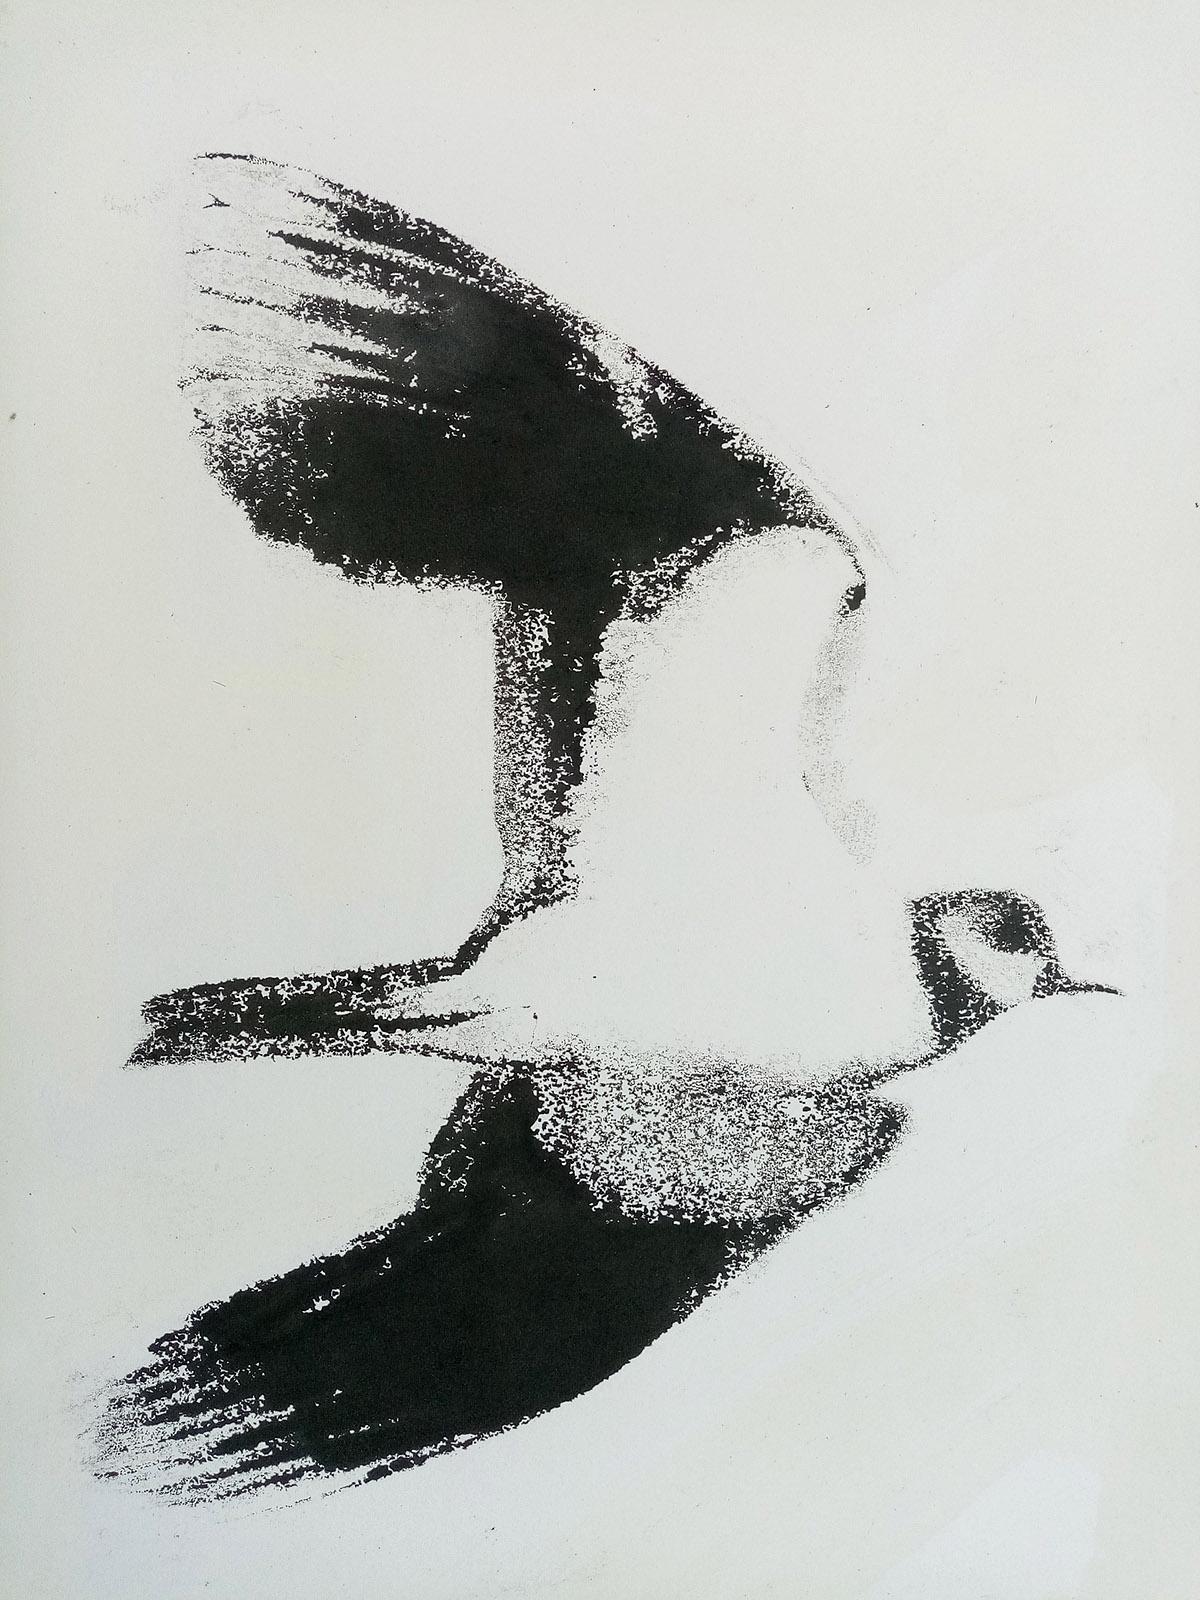 Susie Hunt, 'Plover', monoprint